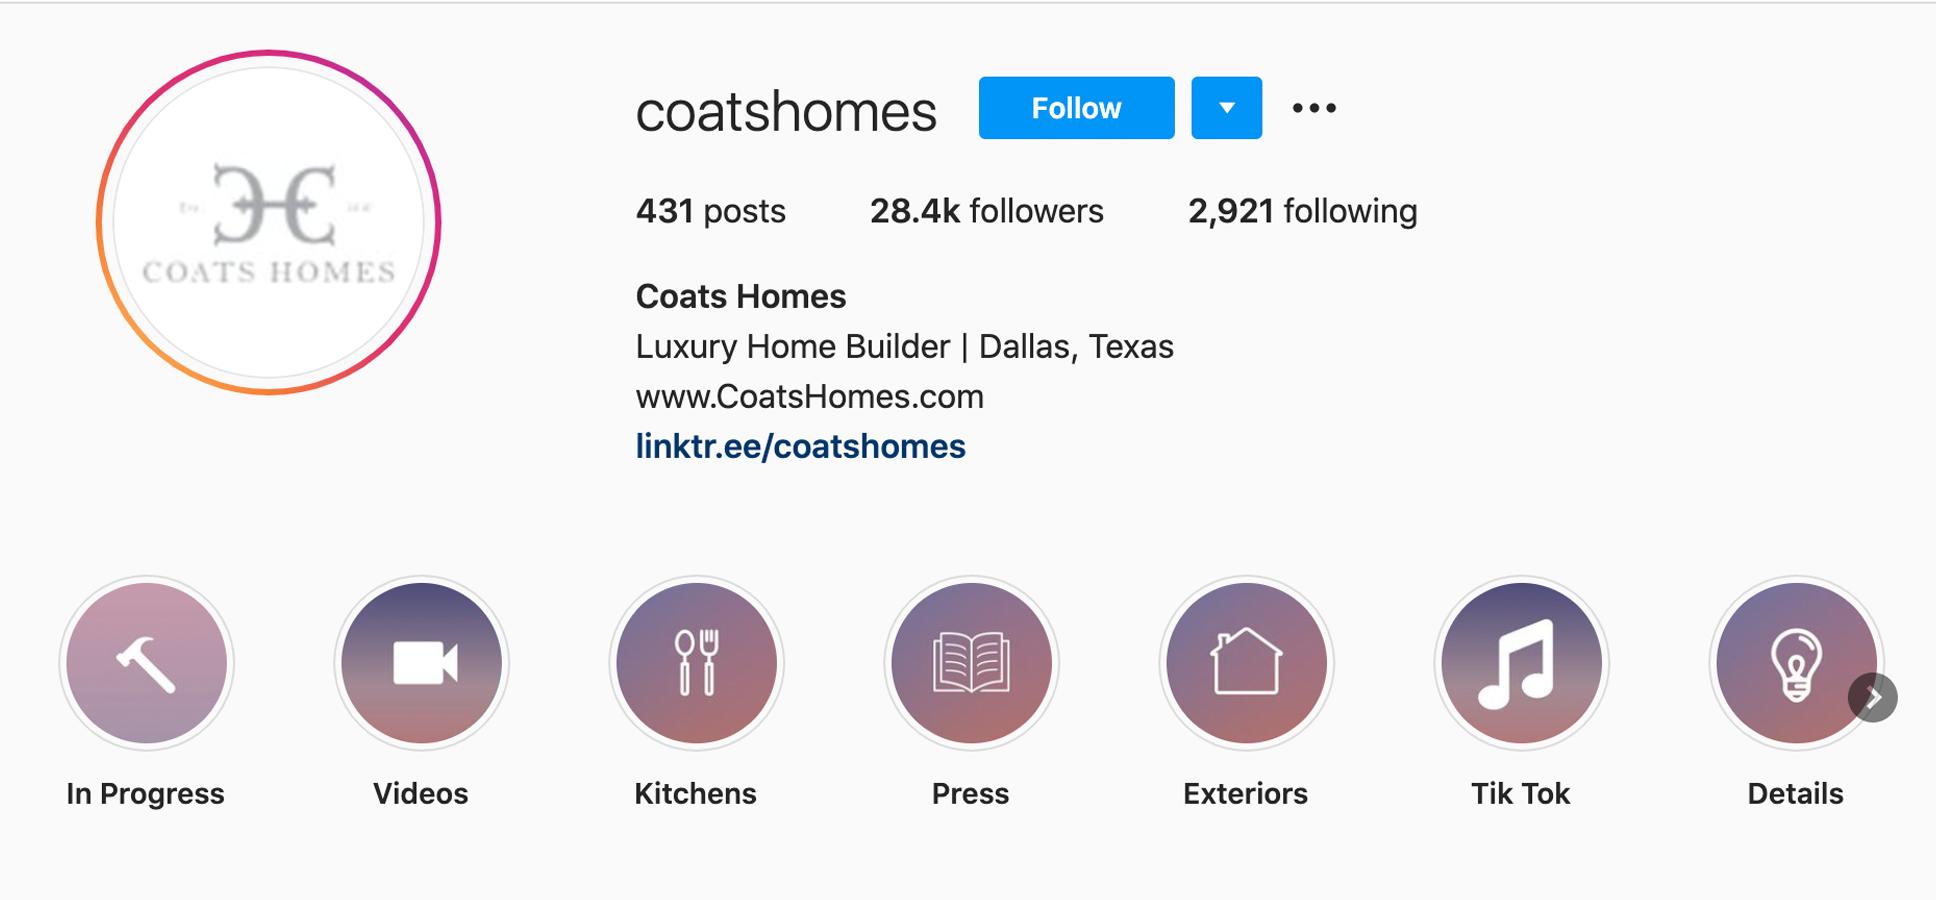 coatshomes-instagram-profile